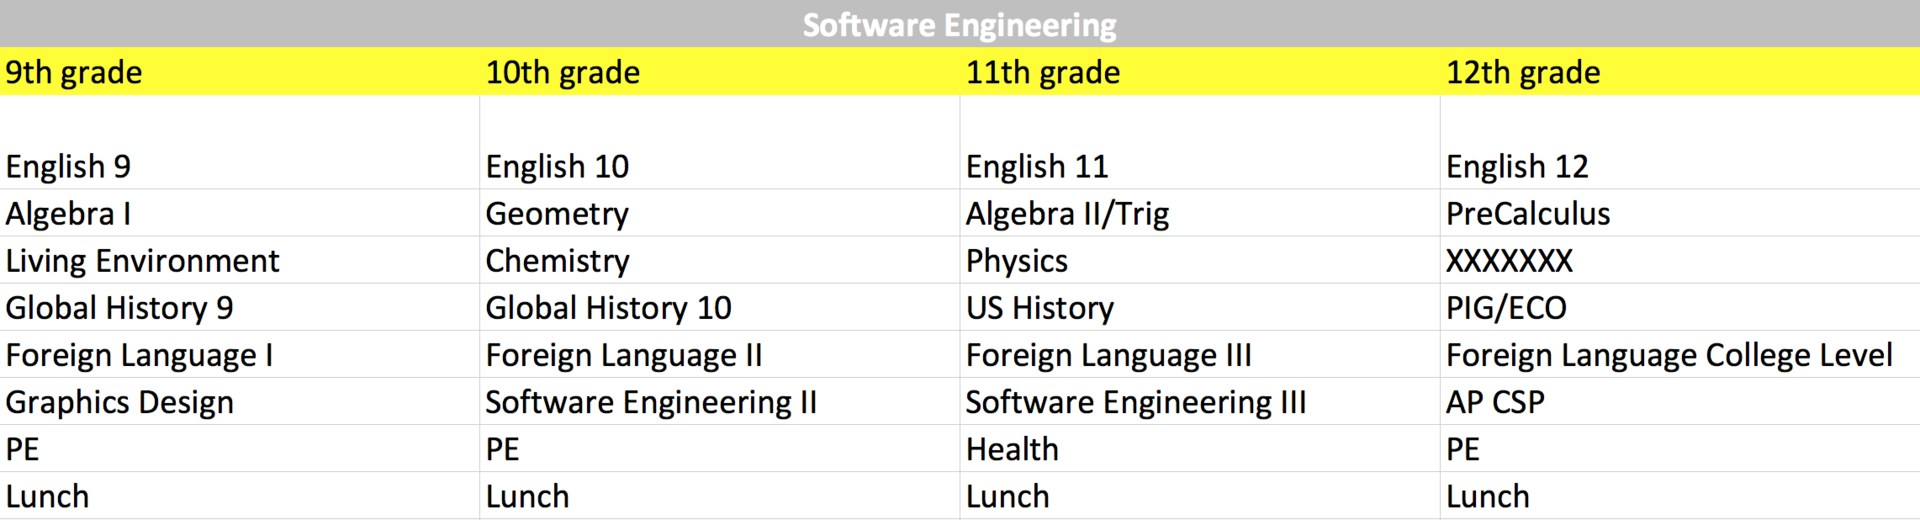 Software Engineering Student Program